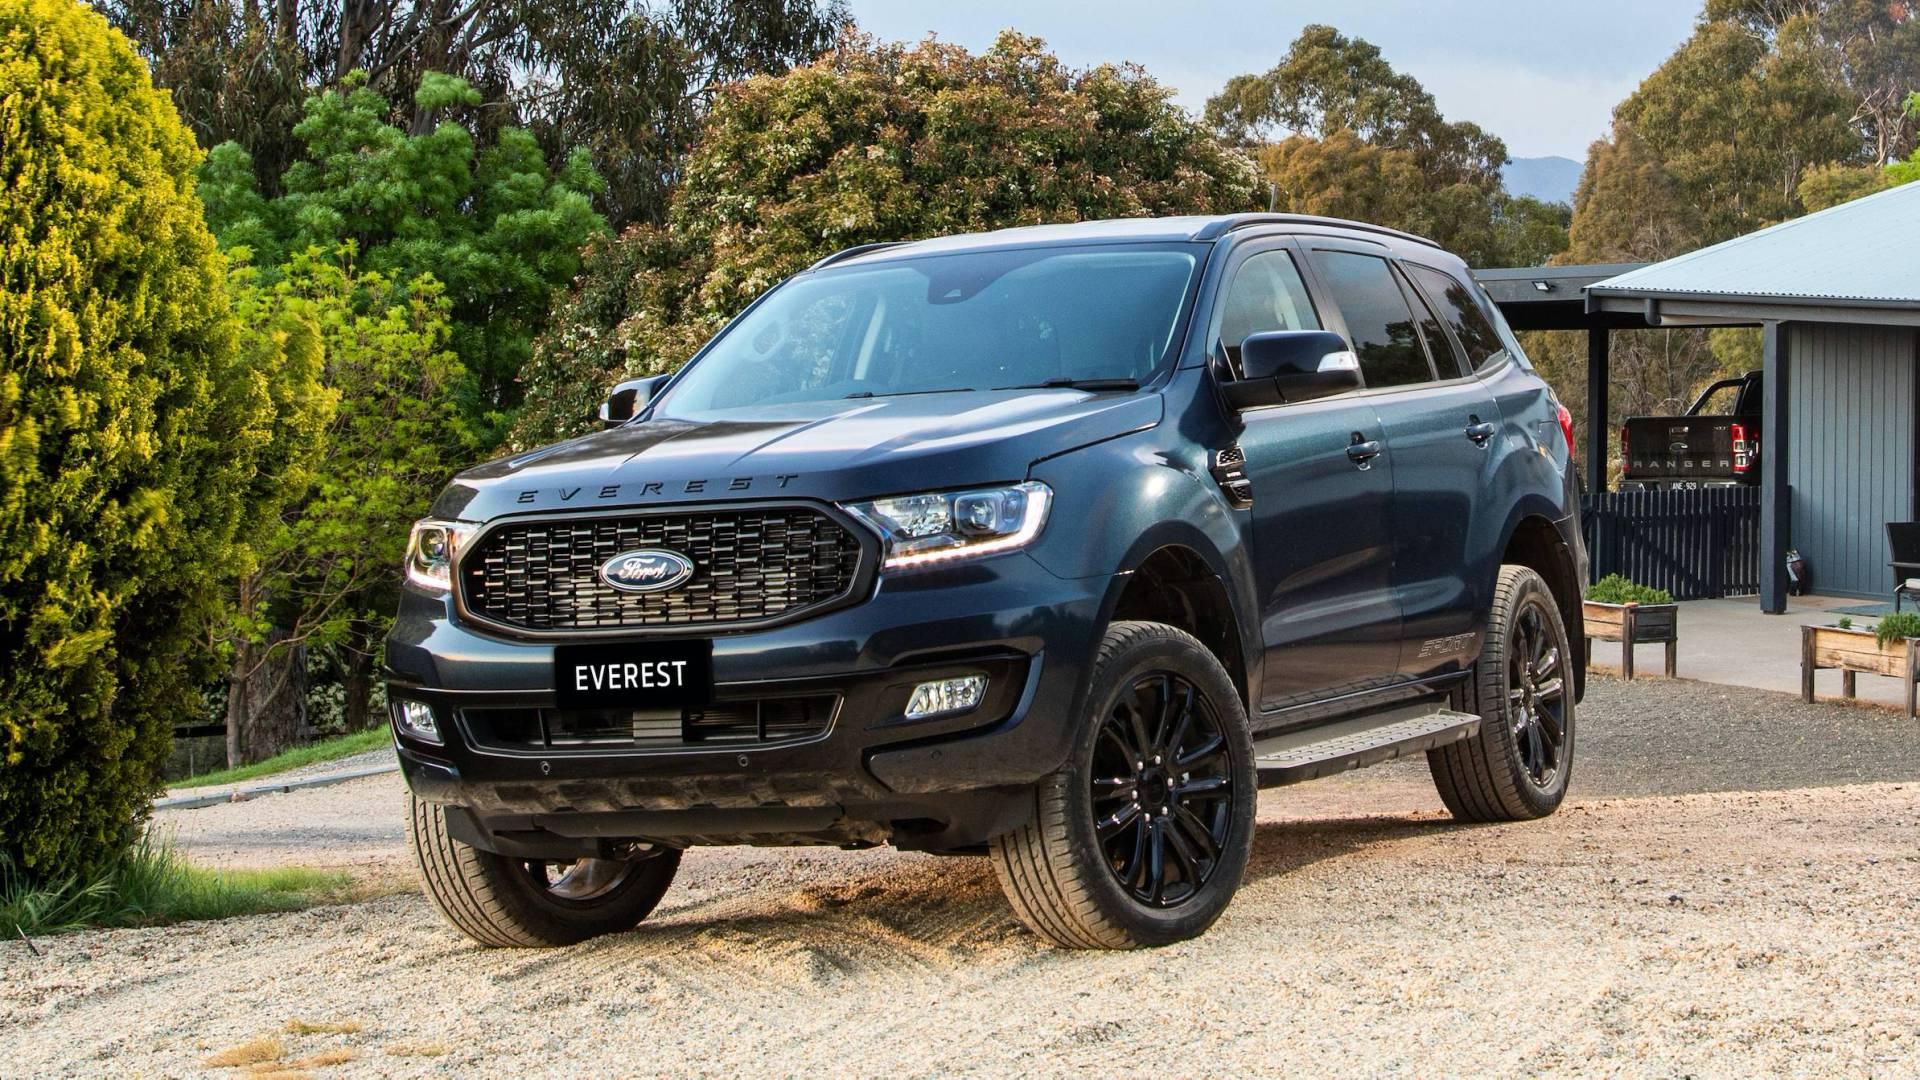 'Soi' Ford Everest Sport 2020 giá hơn 1 tỷ vừa ra mắt